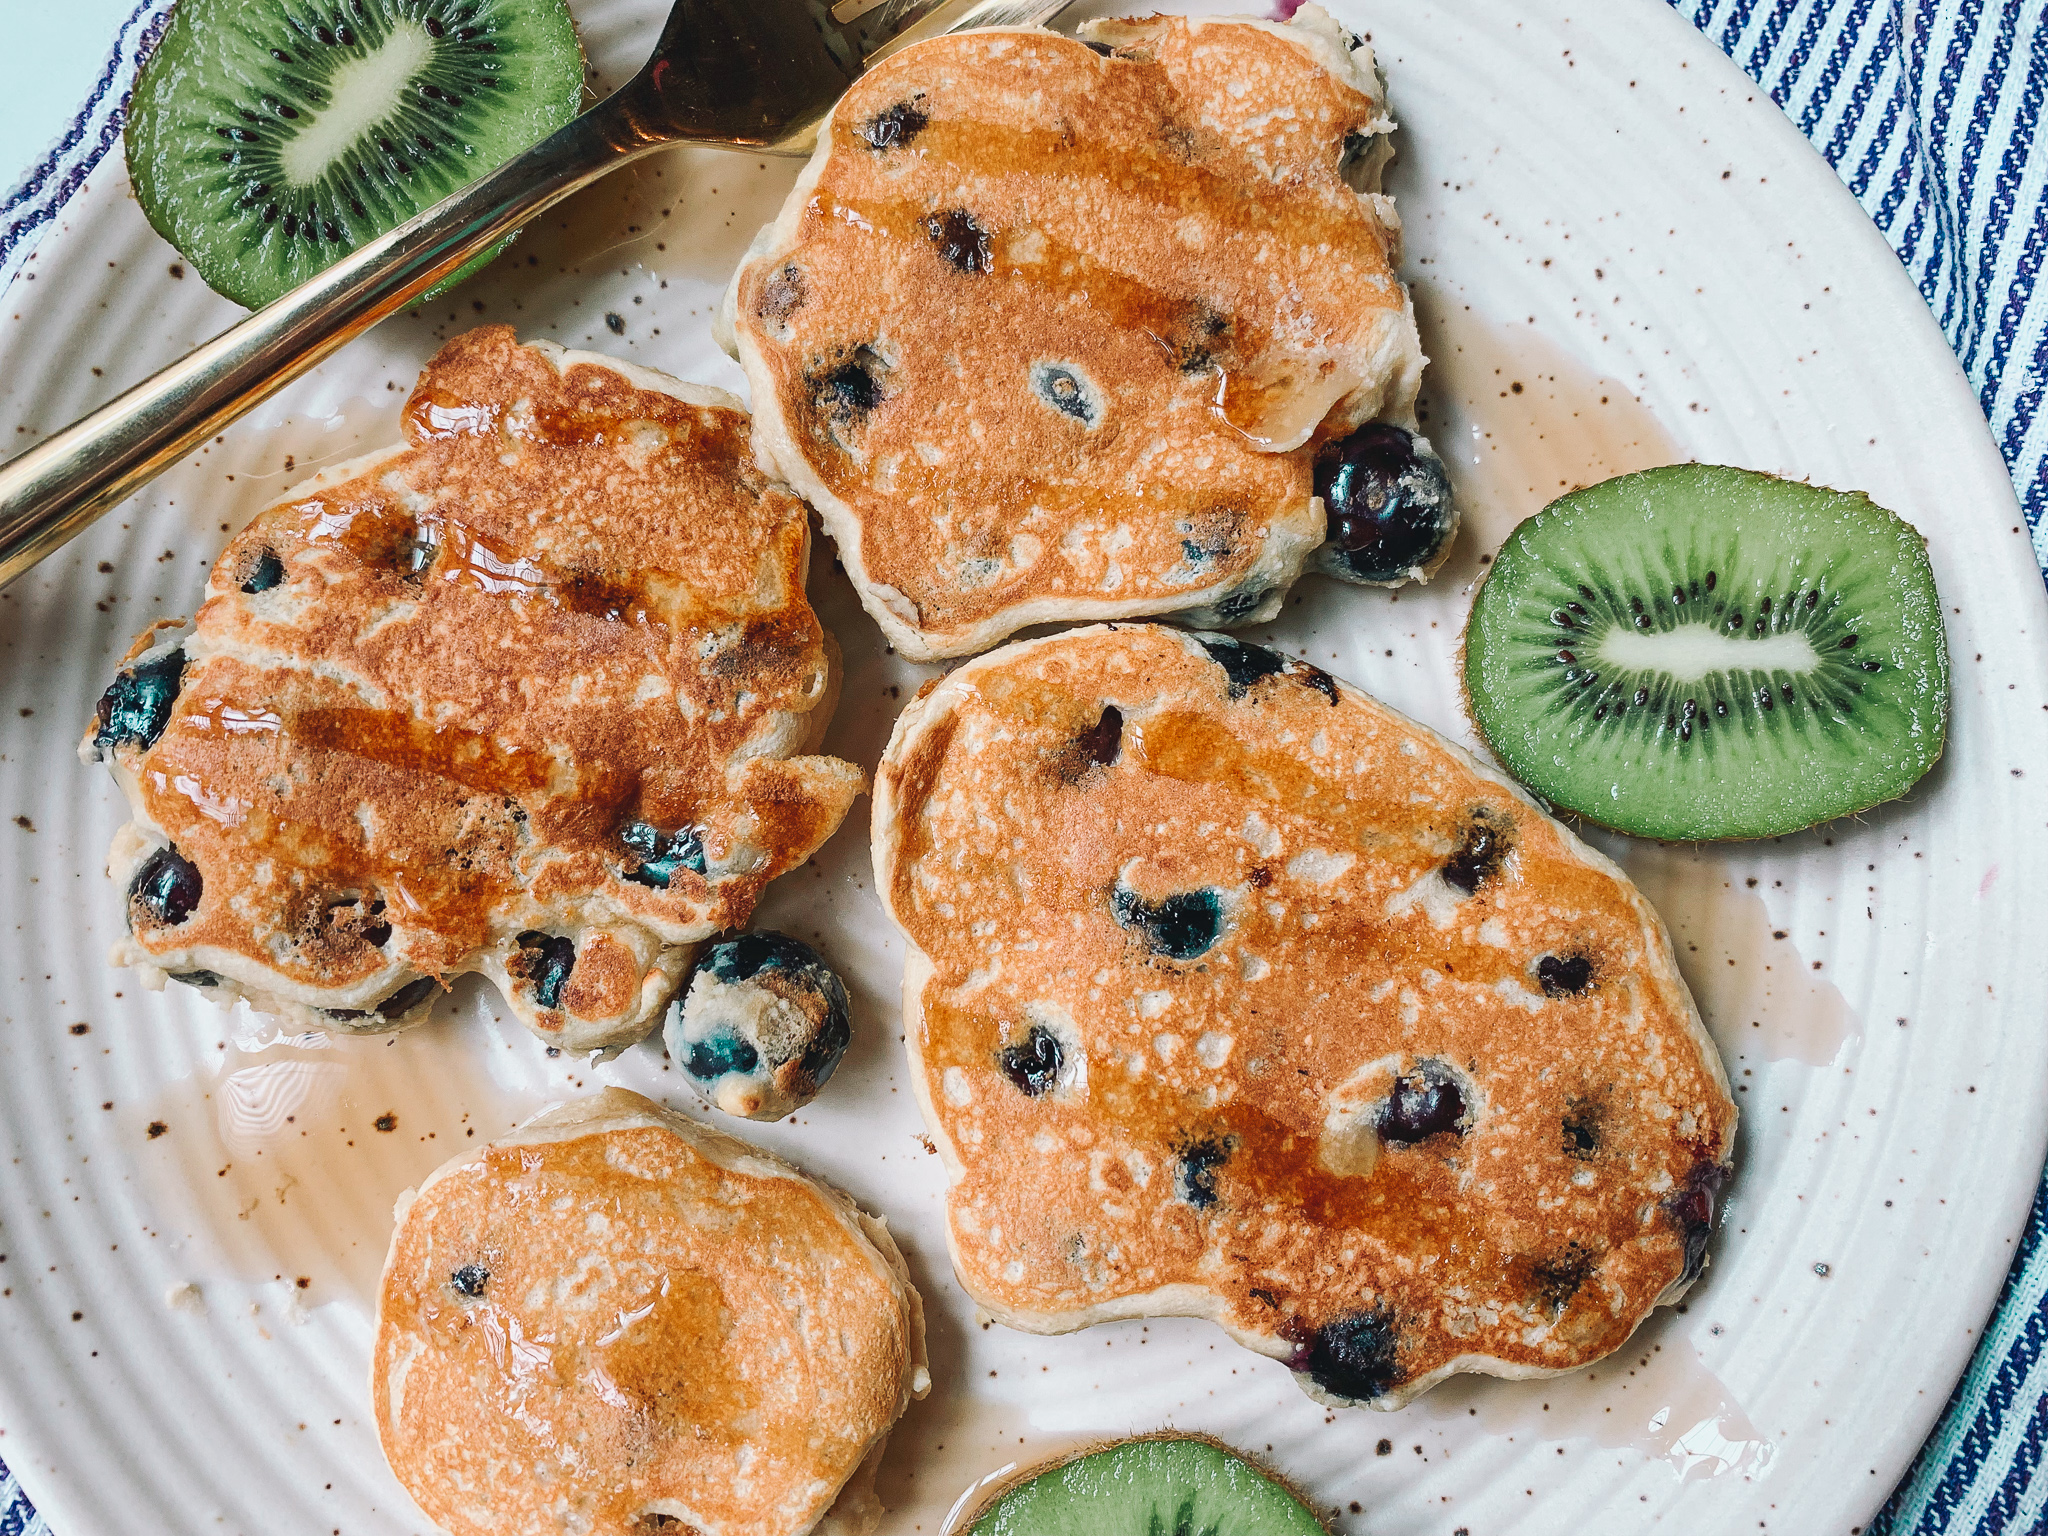 blueberry breakfast protein pancakes gluten free dairy free low carb paleo birchblender